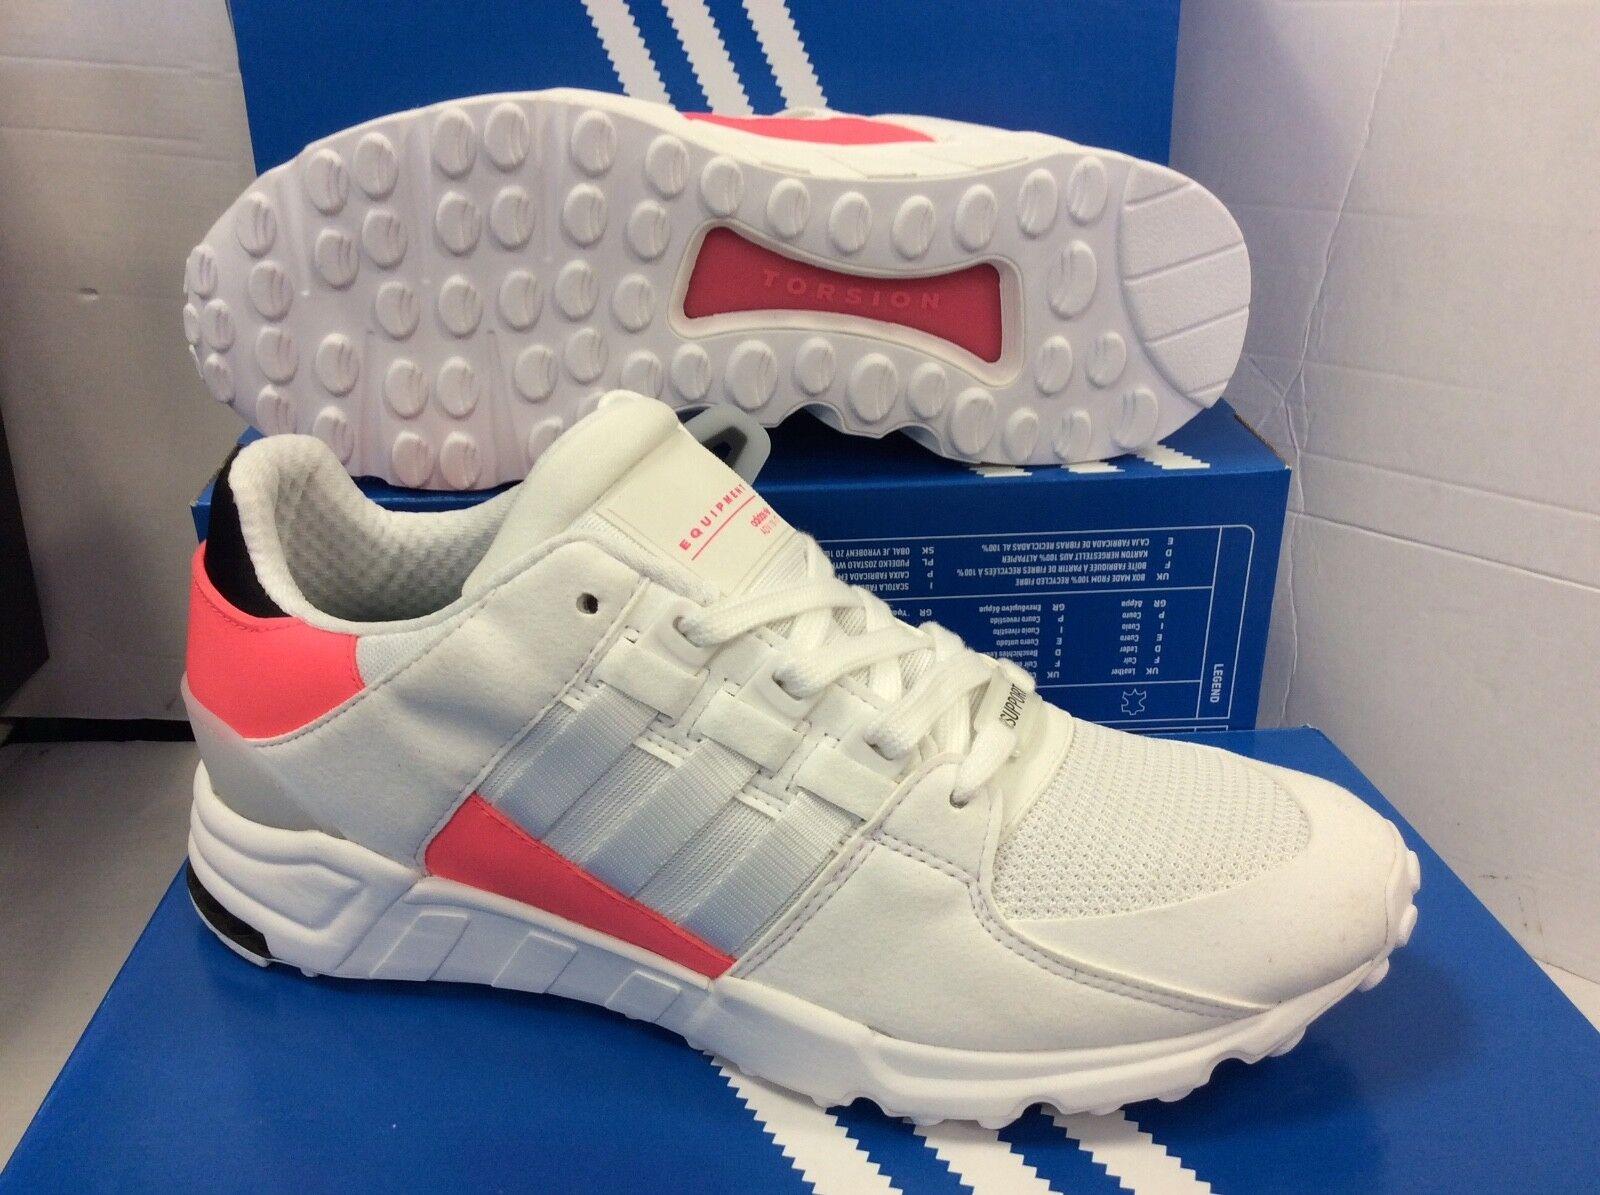 Adidas Originals EQT Support Uomo Scarpe da ginnastica RF BA7716, Taglia /EUR 42.5